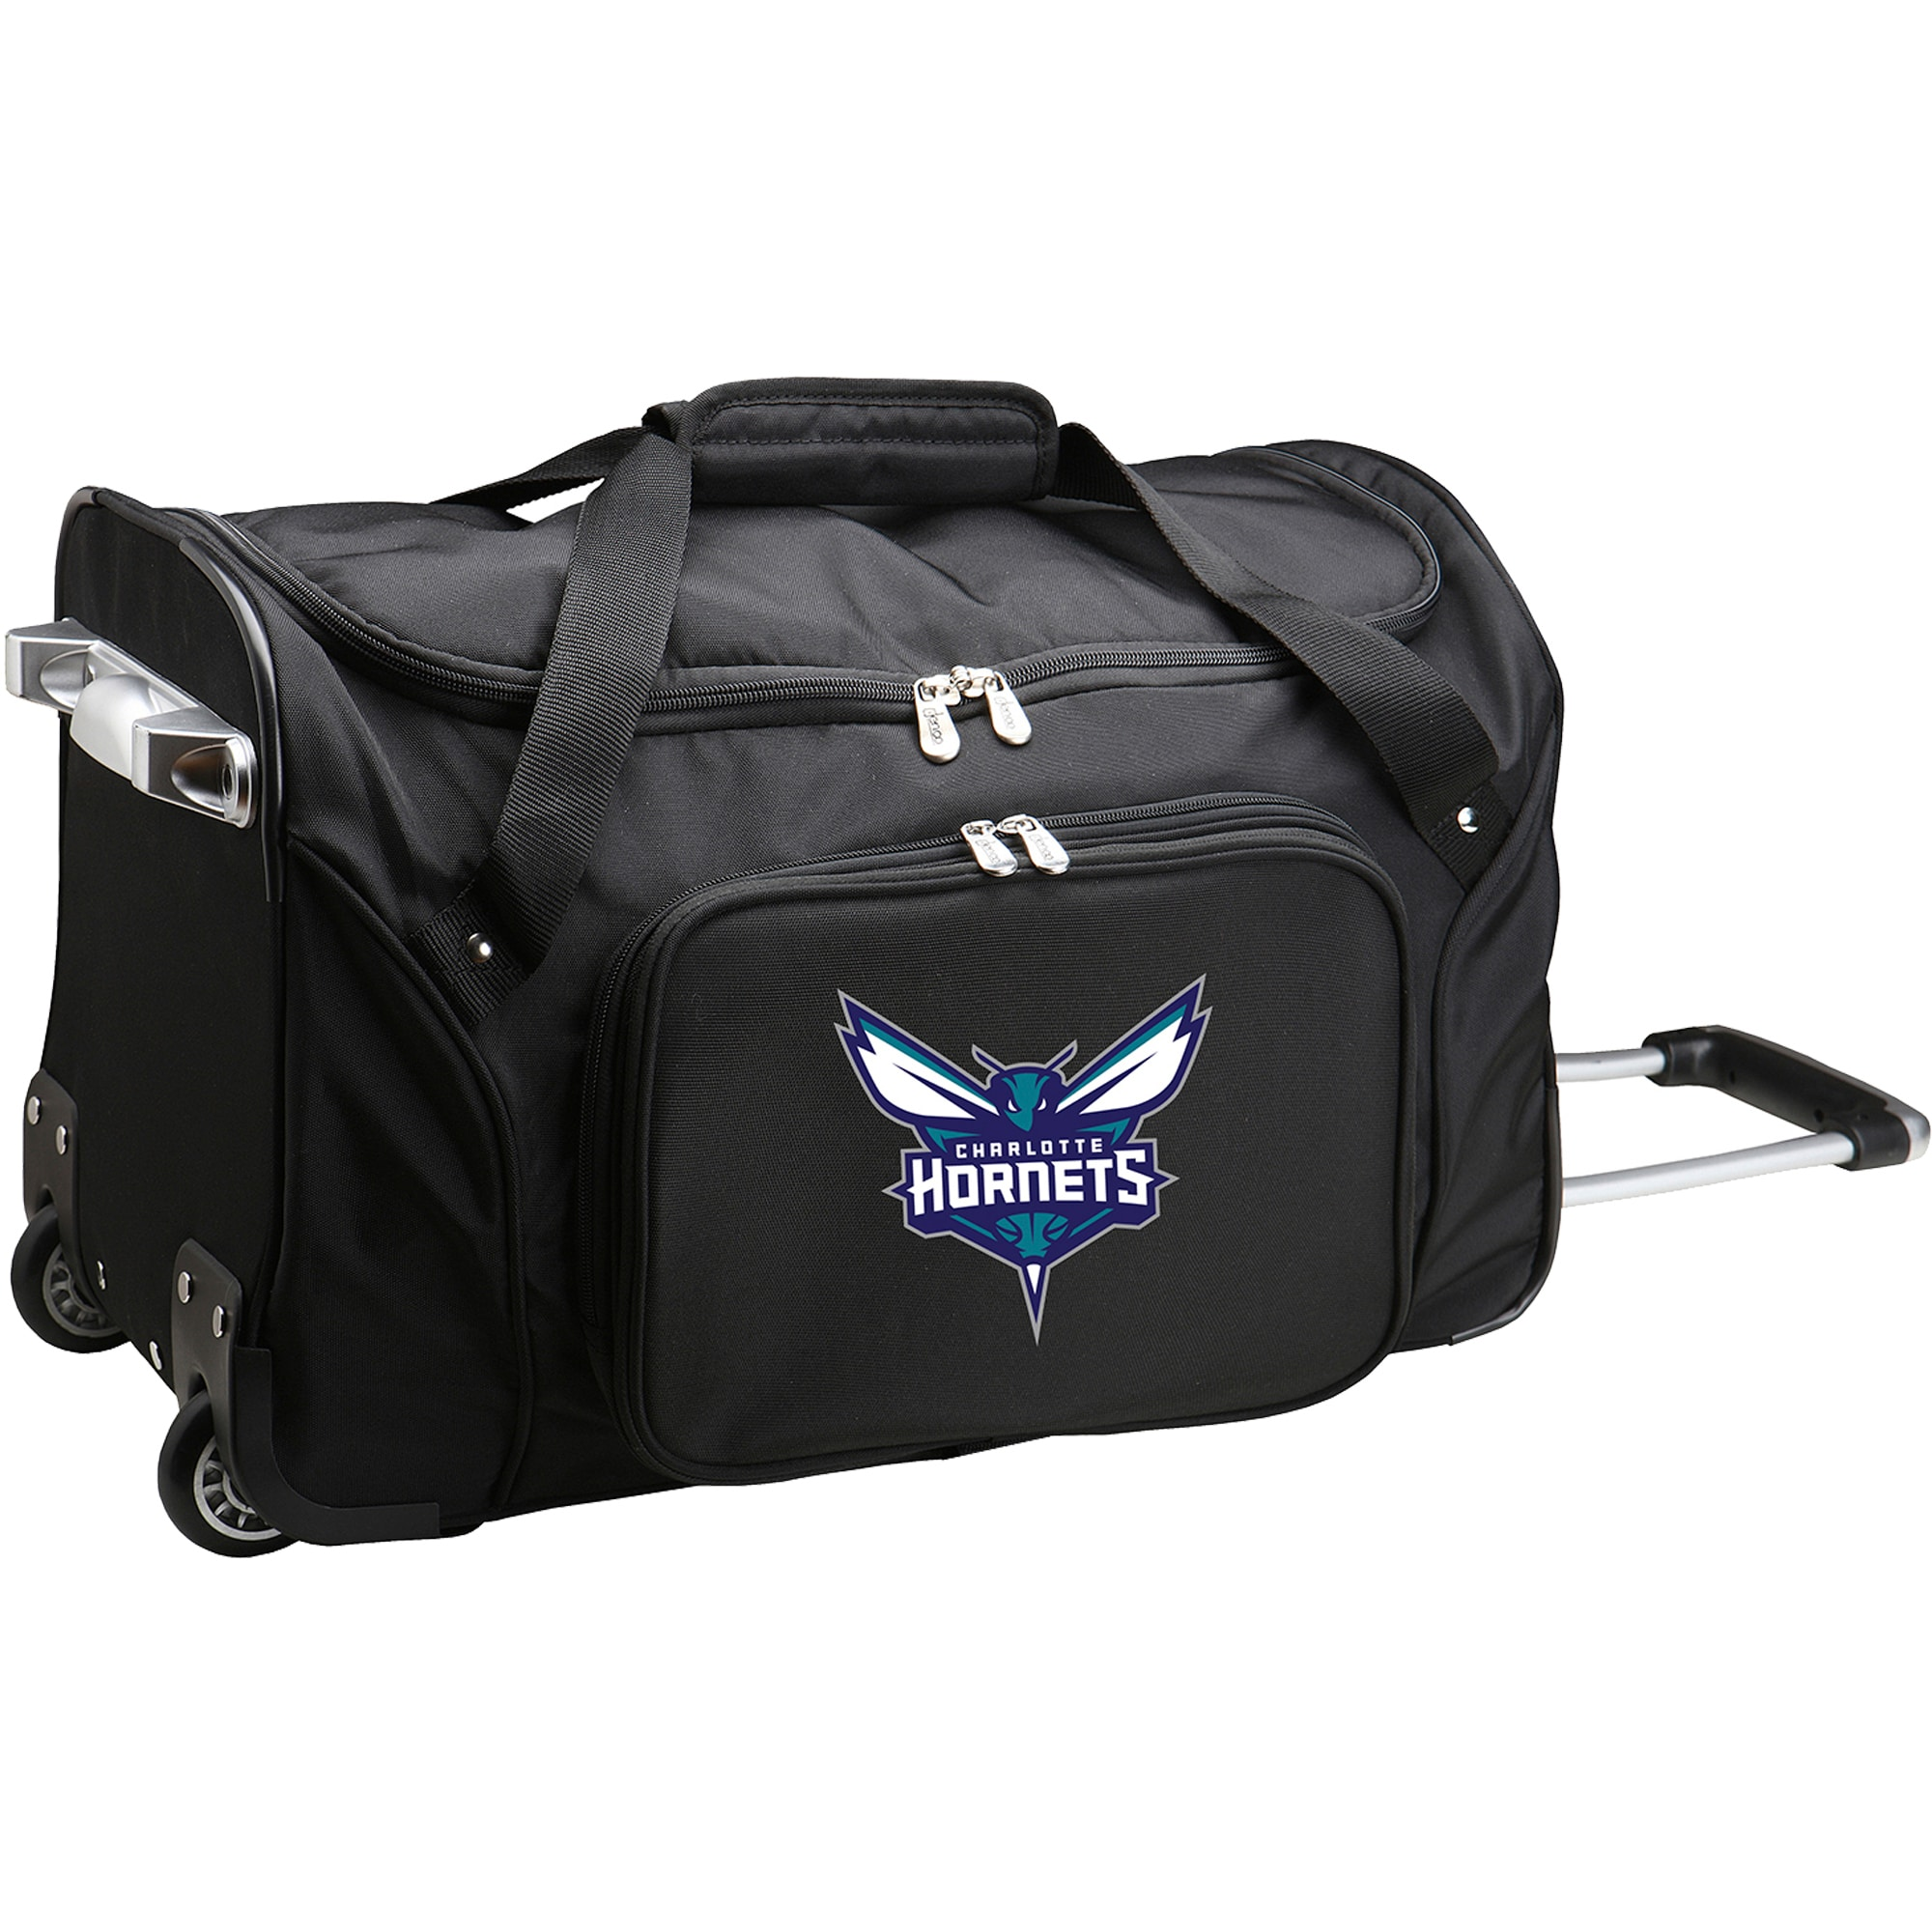 "Charlotte Hornets 22"" 2-Wheeled Duffel Bag - Black"